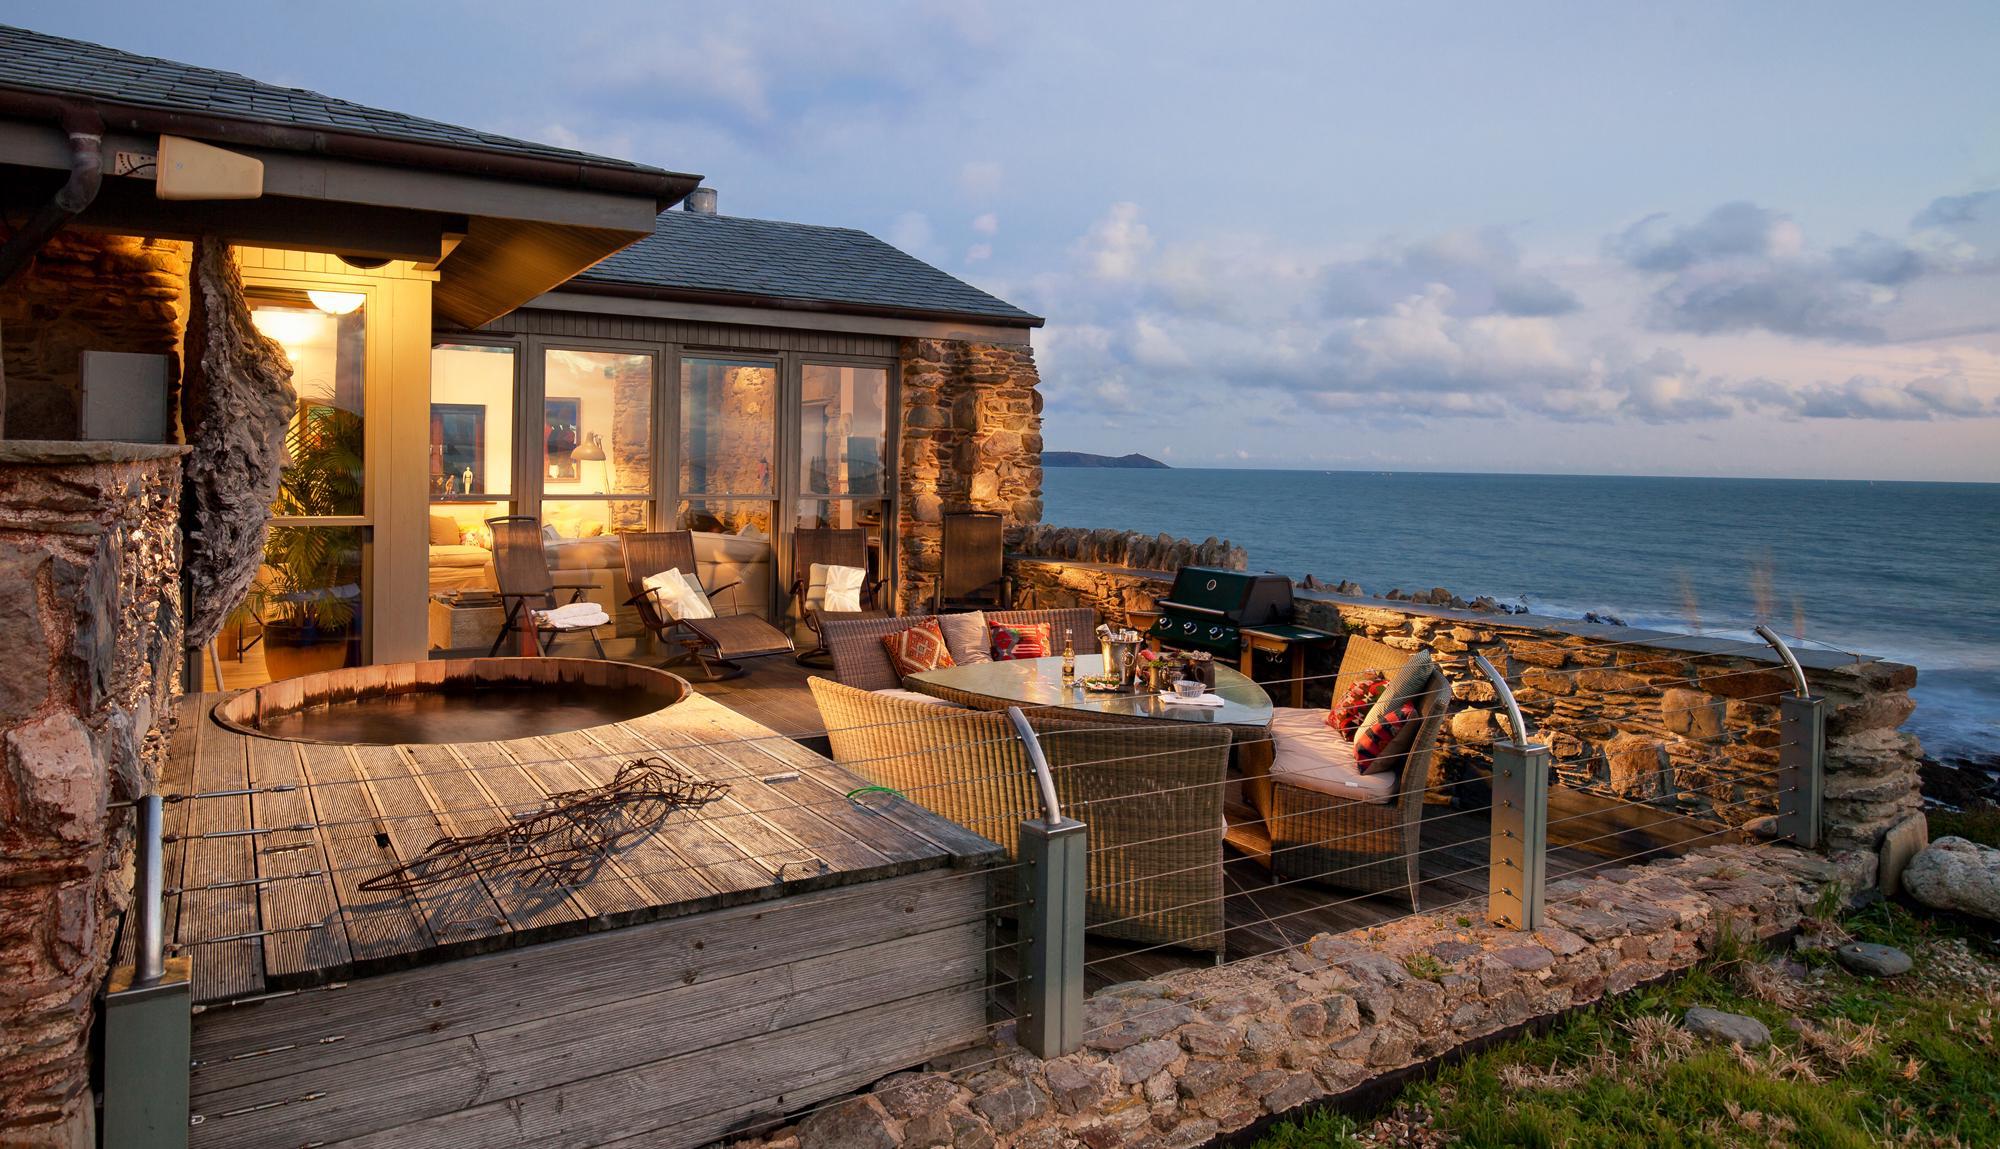 South West Beach House Design Project: Buddha Beach House, Cornwall